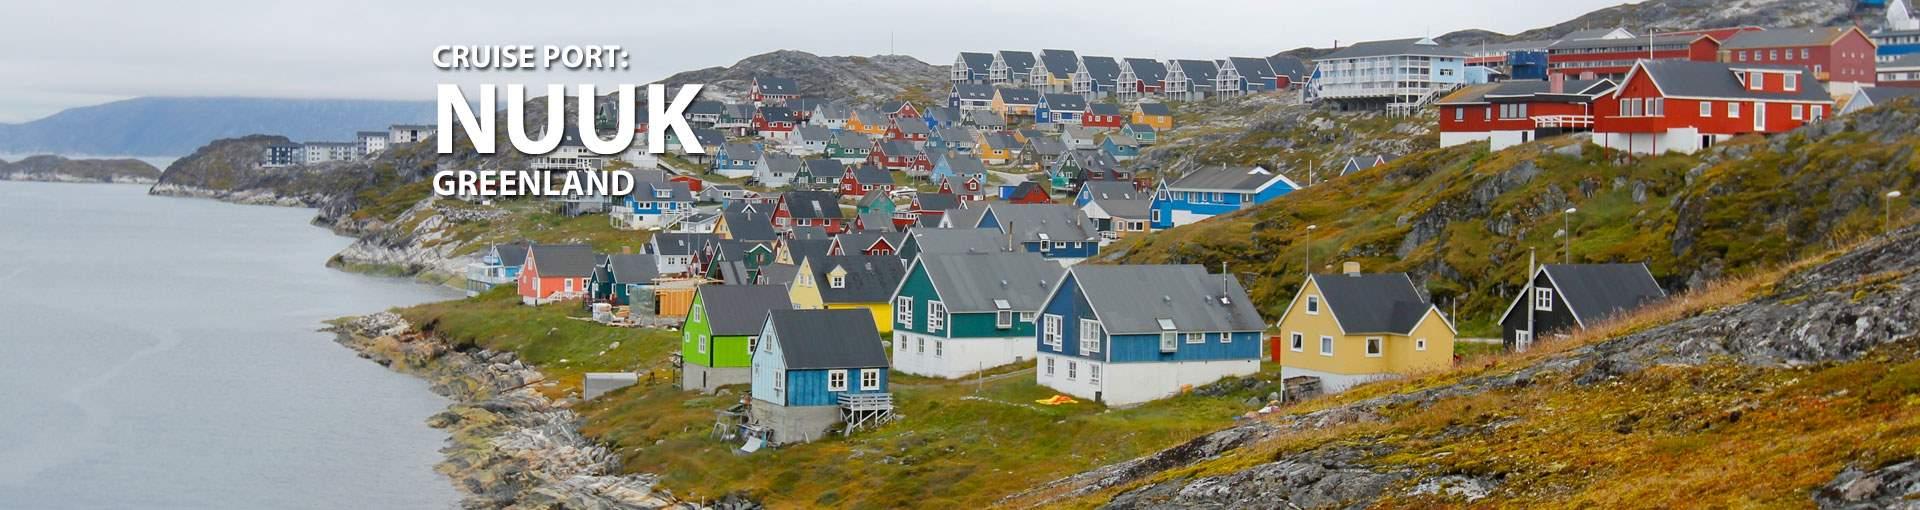 Cruises to Nuuk, Greenland